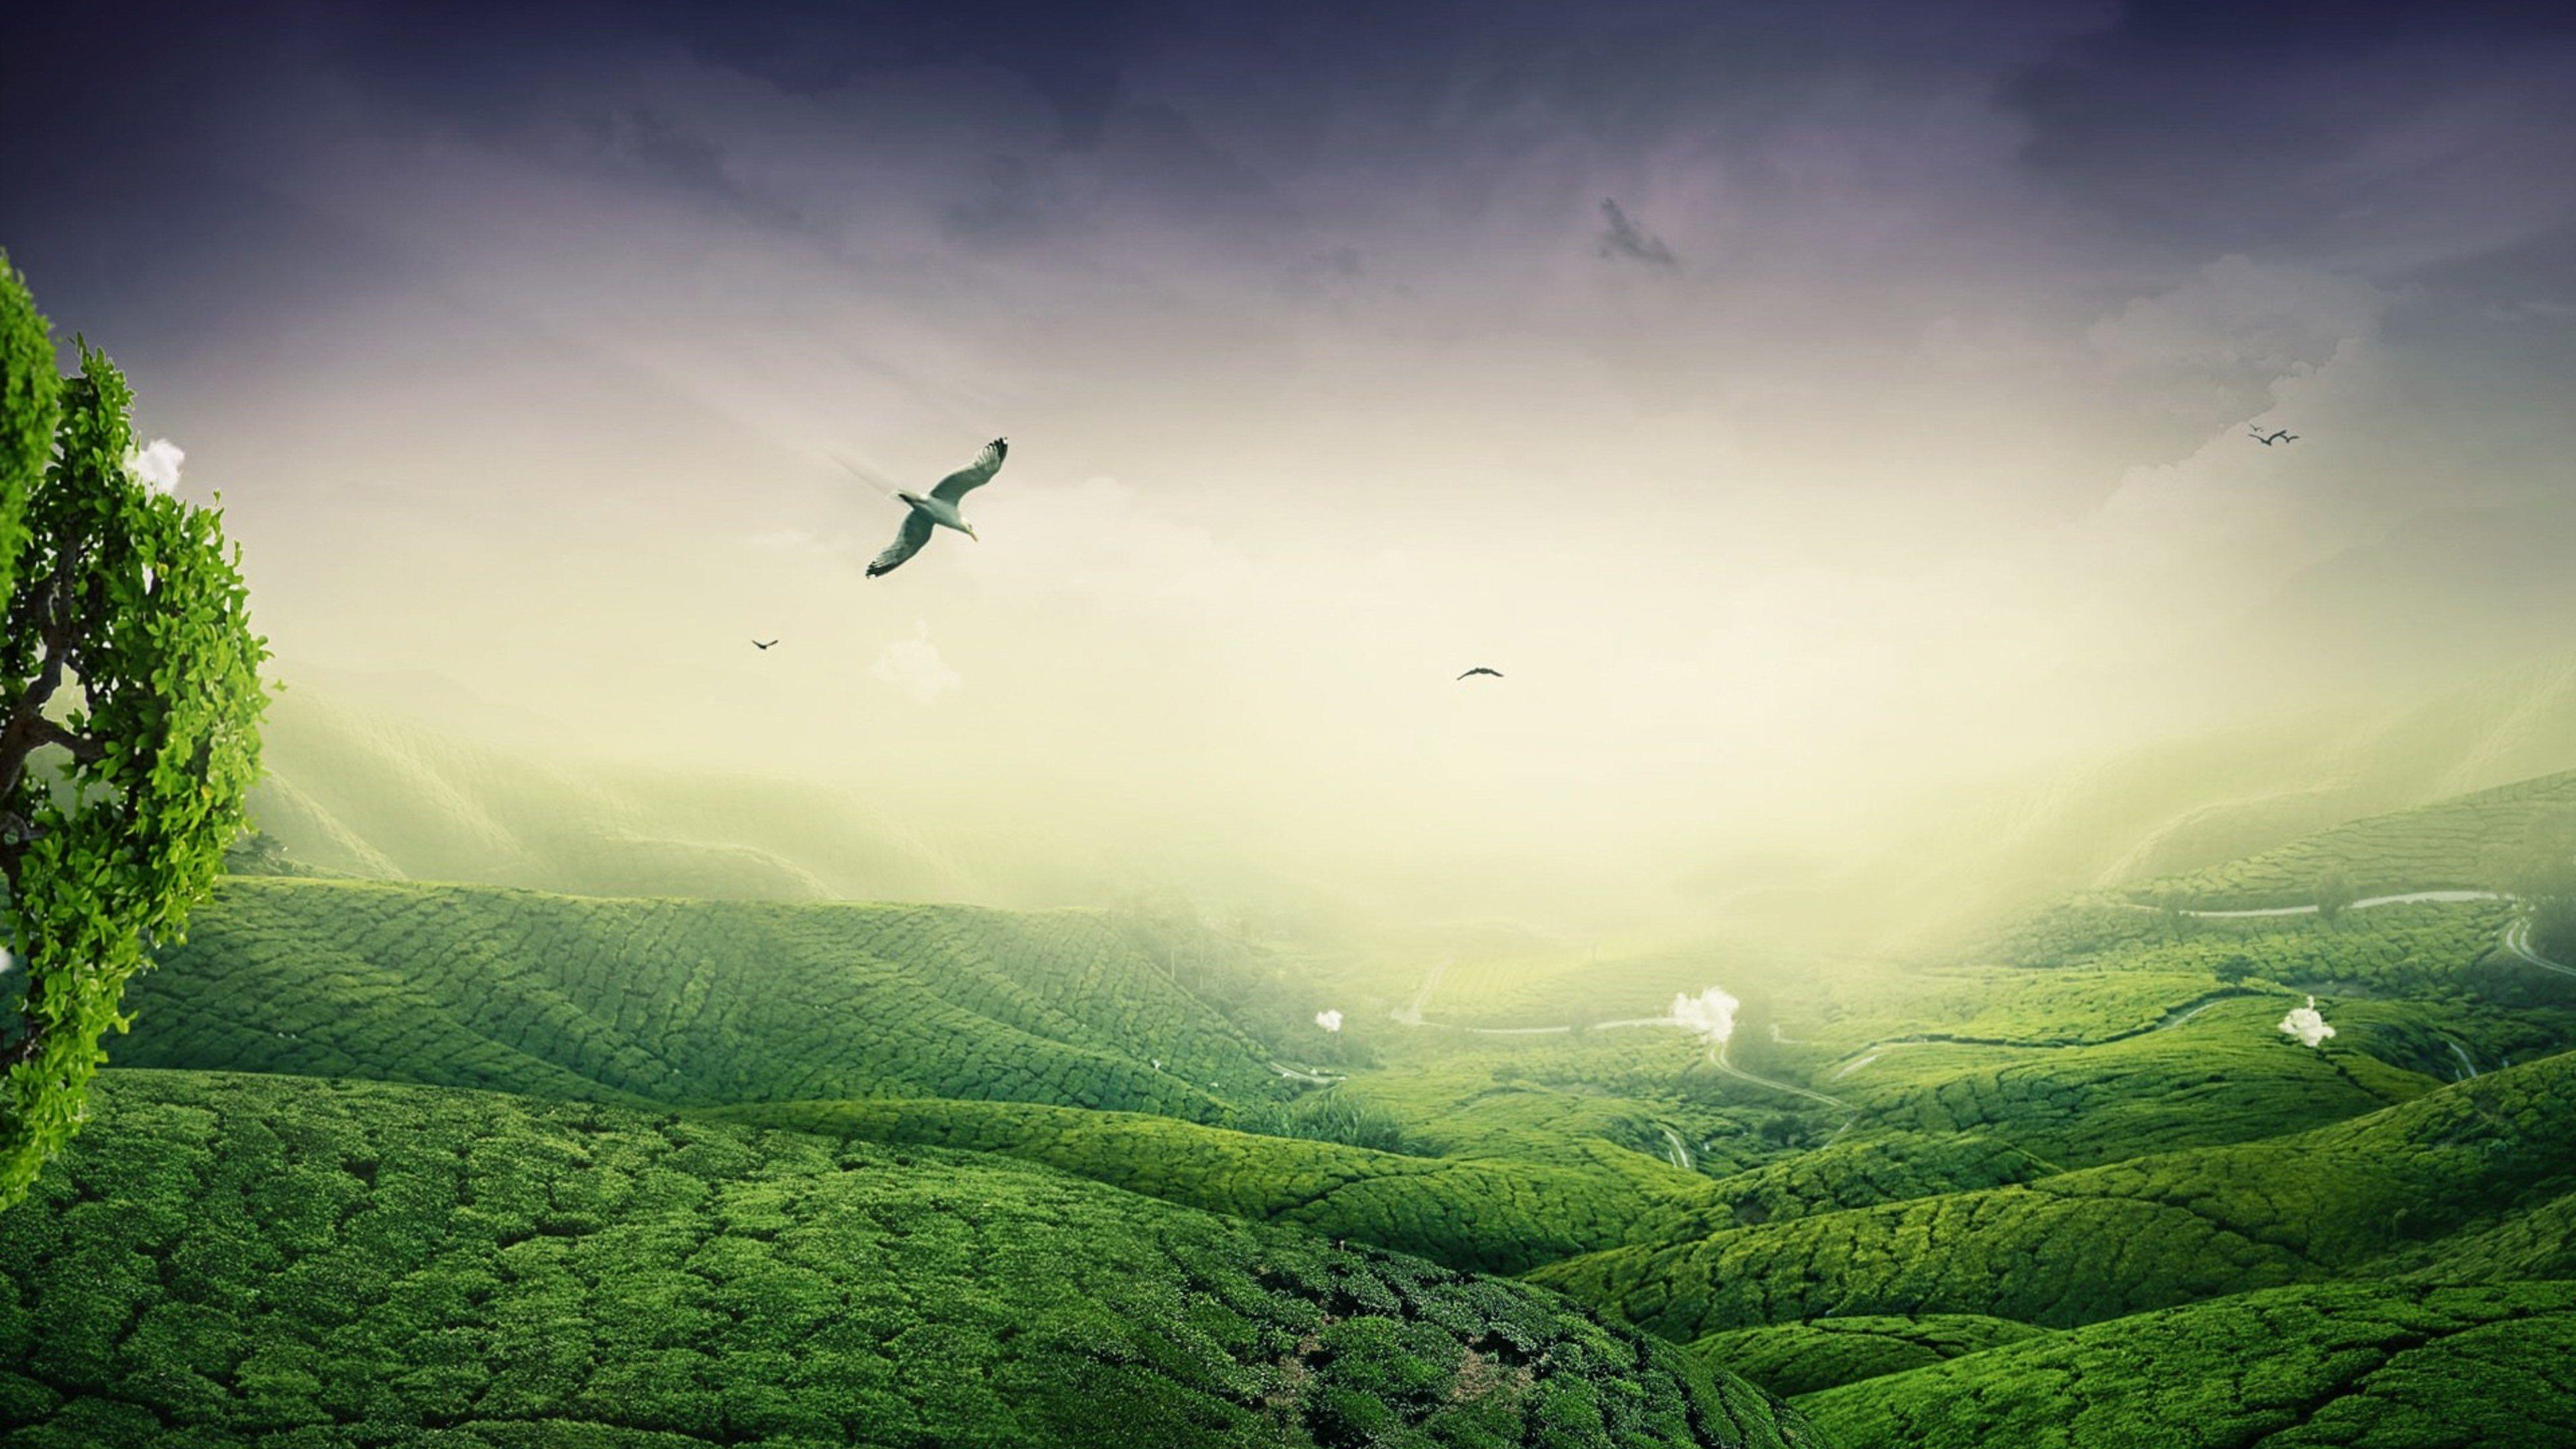 3840x2160 Green 4k Mac Background Wallpaper Beautiful Images Nature Landscape Wallpaper Landscape Background